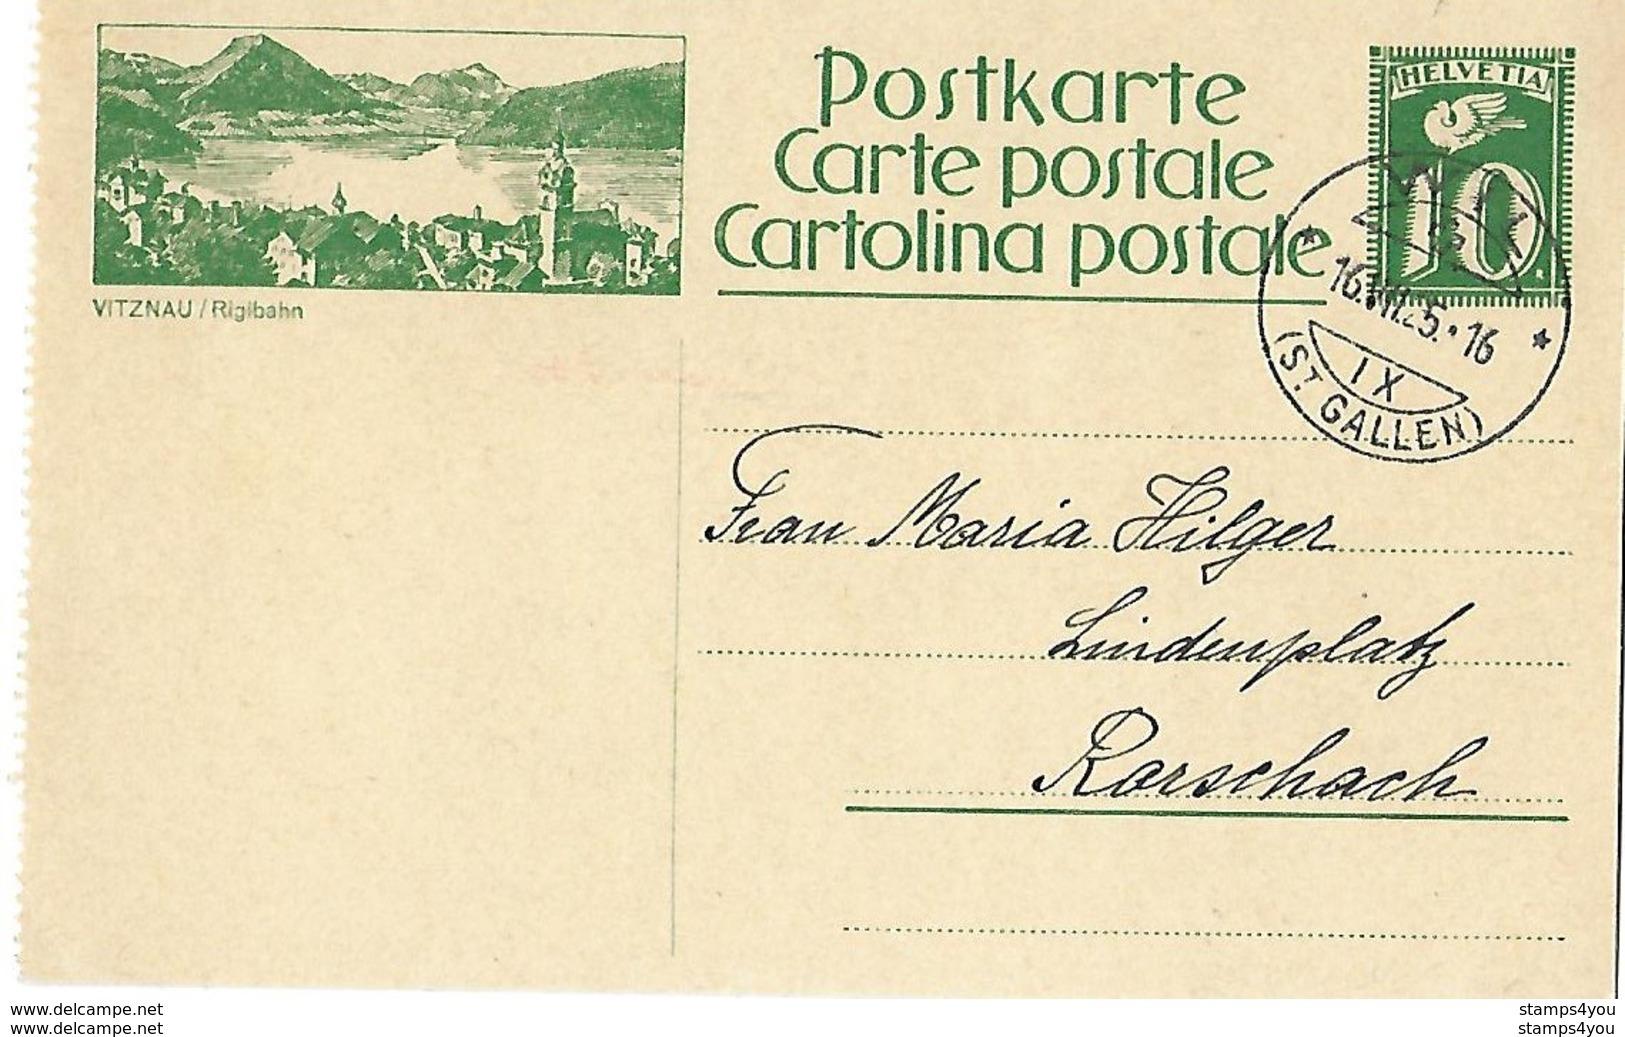 "11 - 48 - Entier Postal Avec Illustration ""Vitznau"" Cachet à Date Wil (St Gallen) 1925 - Interi Postali"